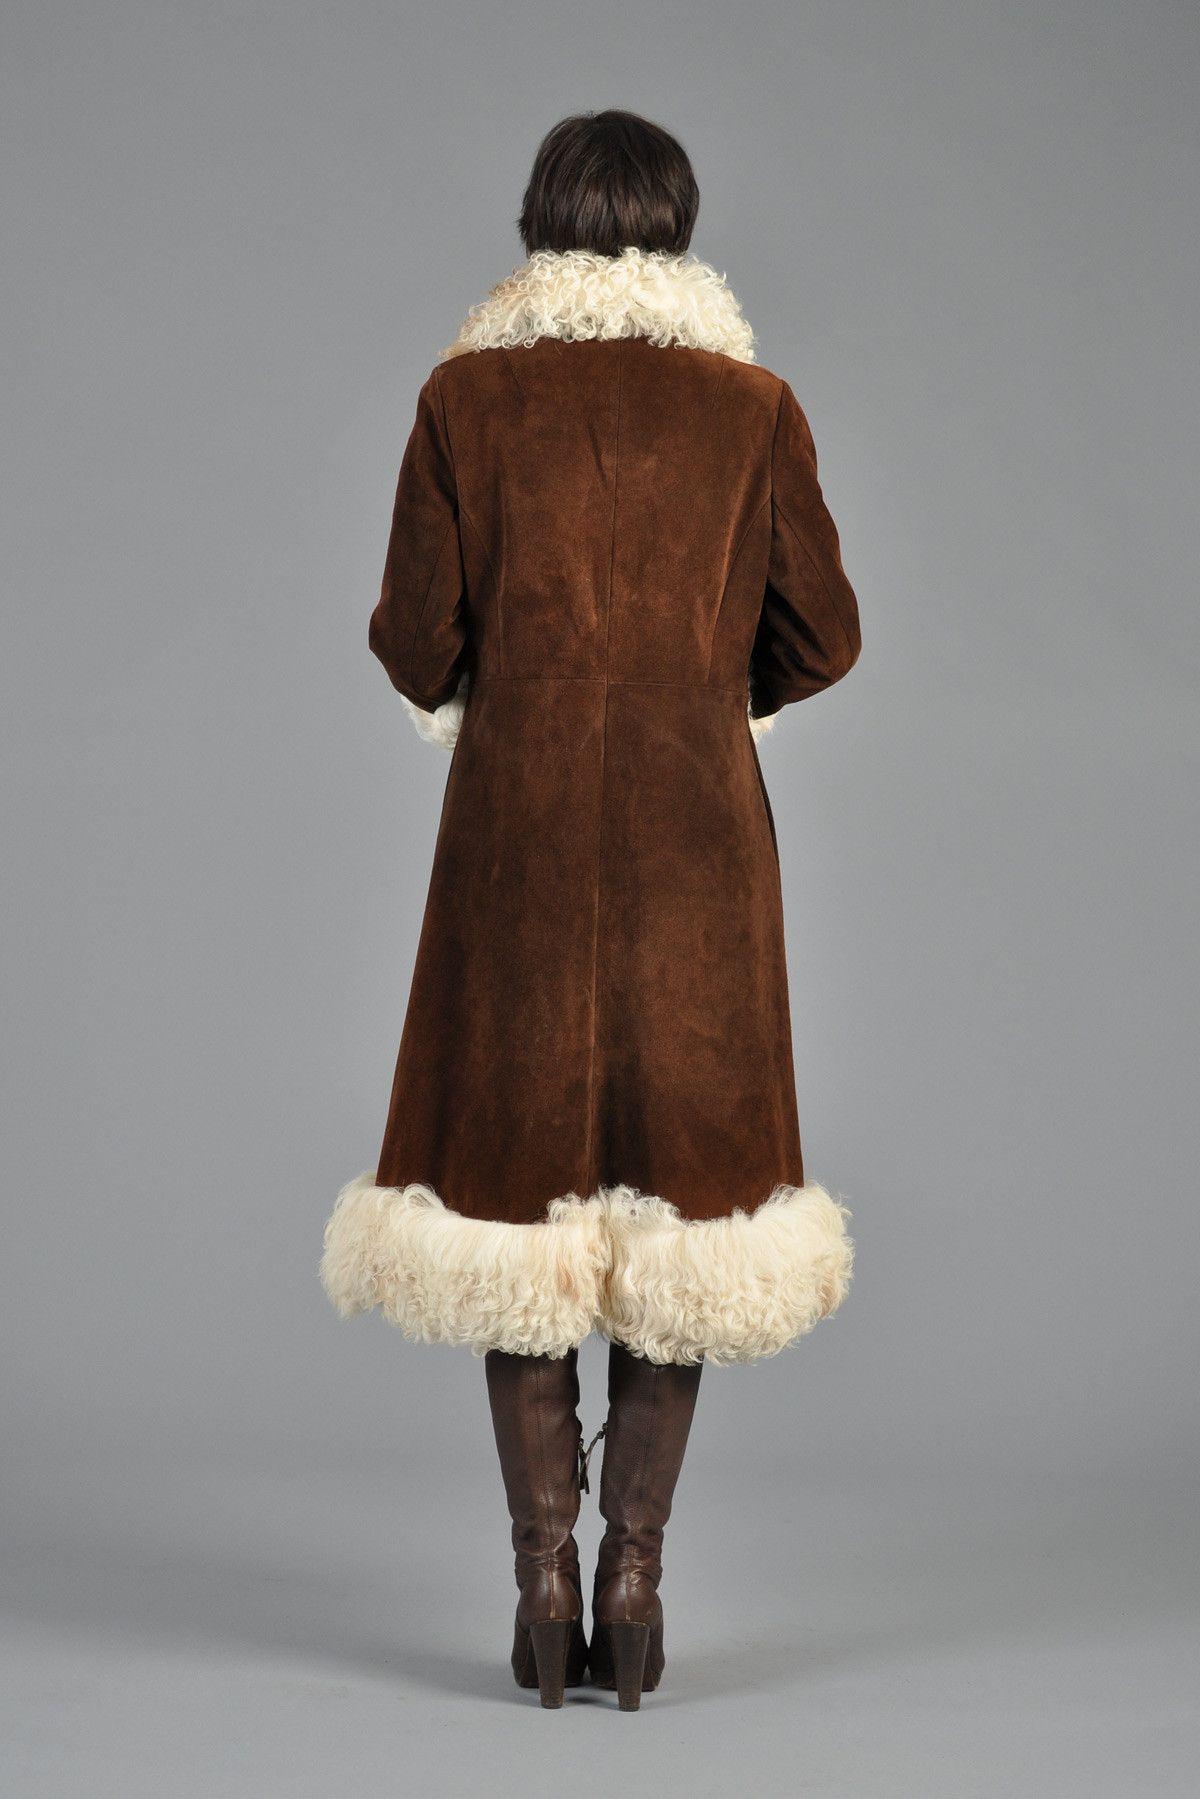 Coats Shearling Su Similar Sheepskin And Leather Naked Pin TBnqxUU